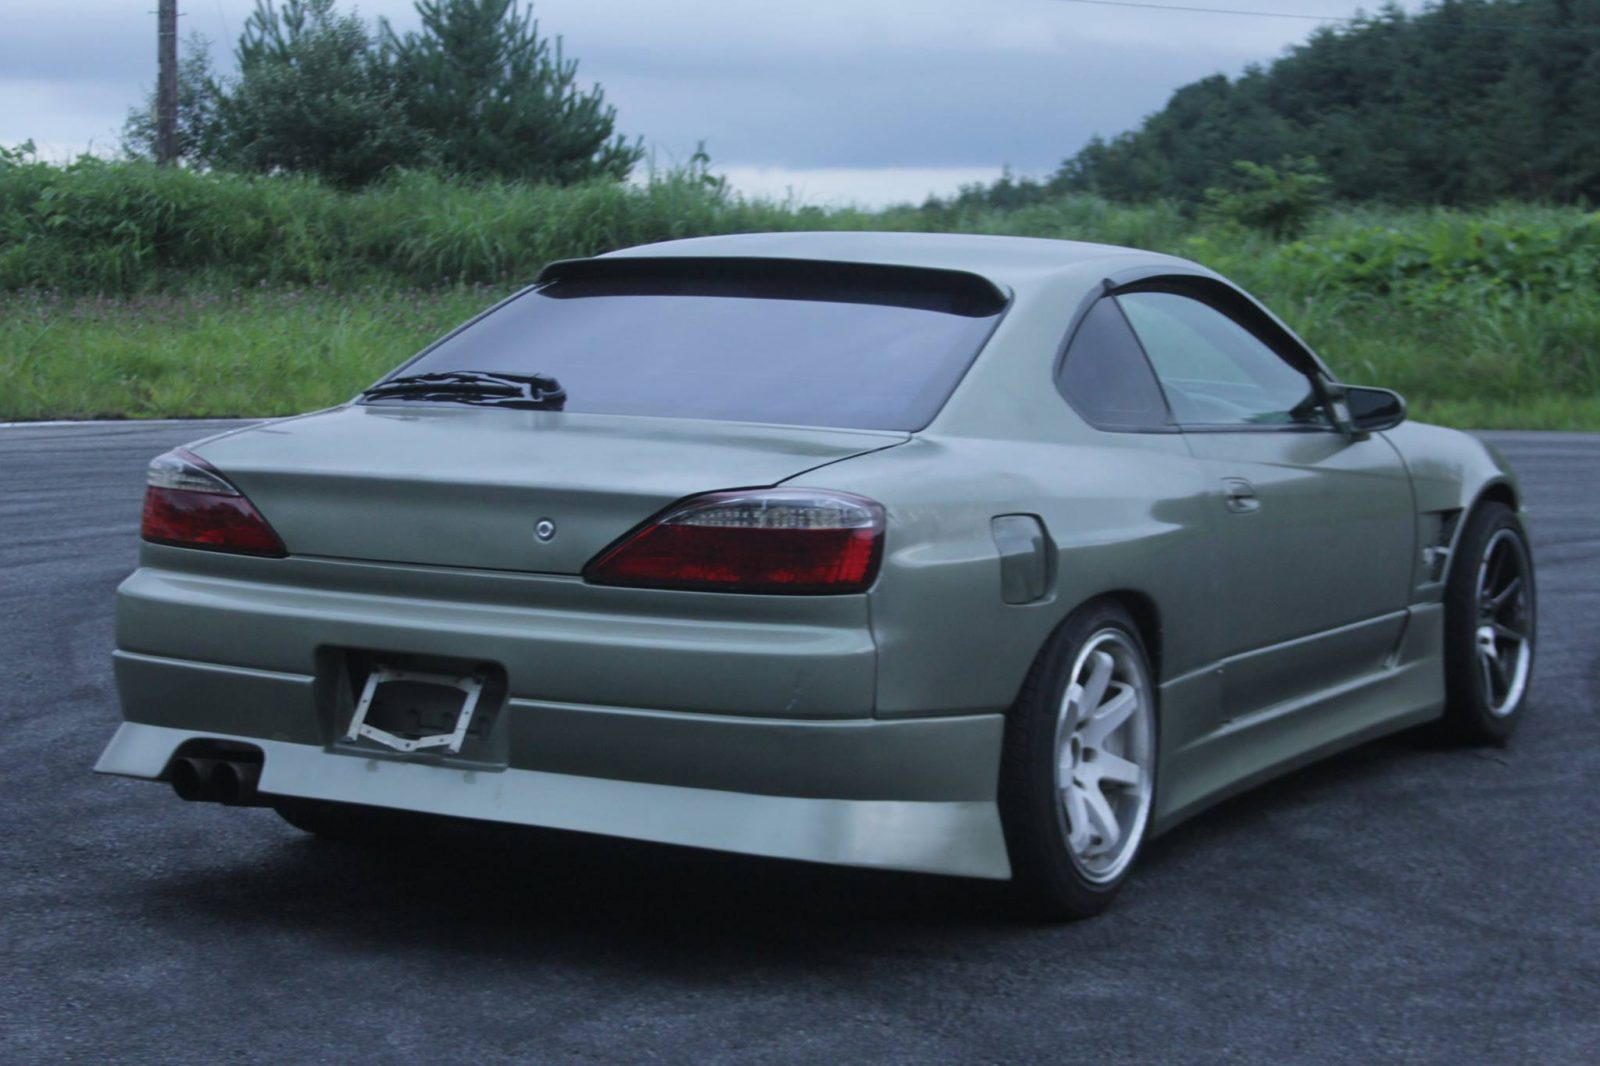 1999 Nissan Silvia S15 Jap Imports Uk